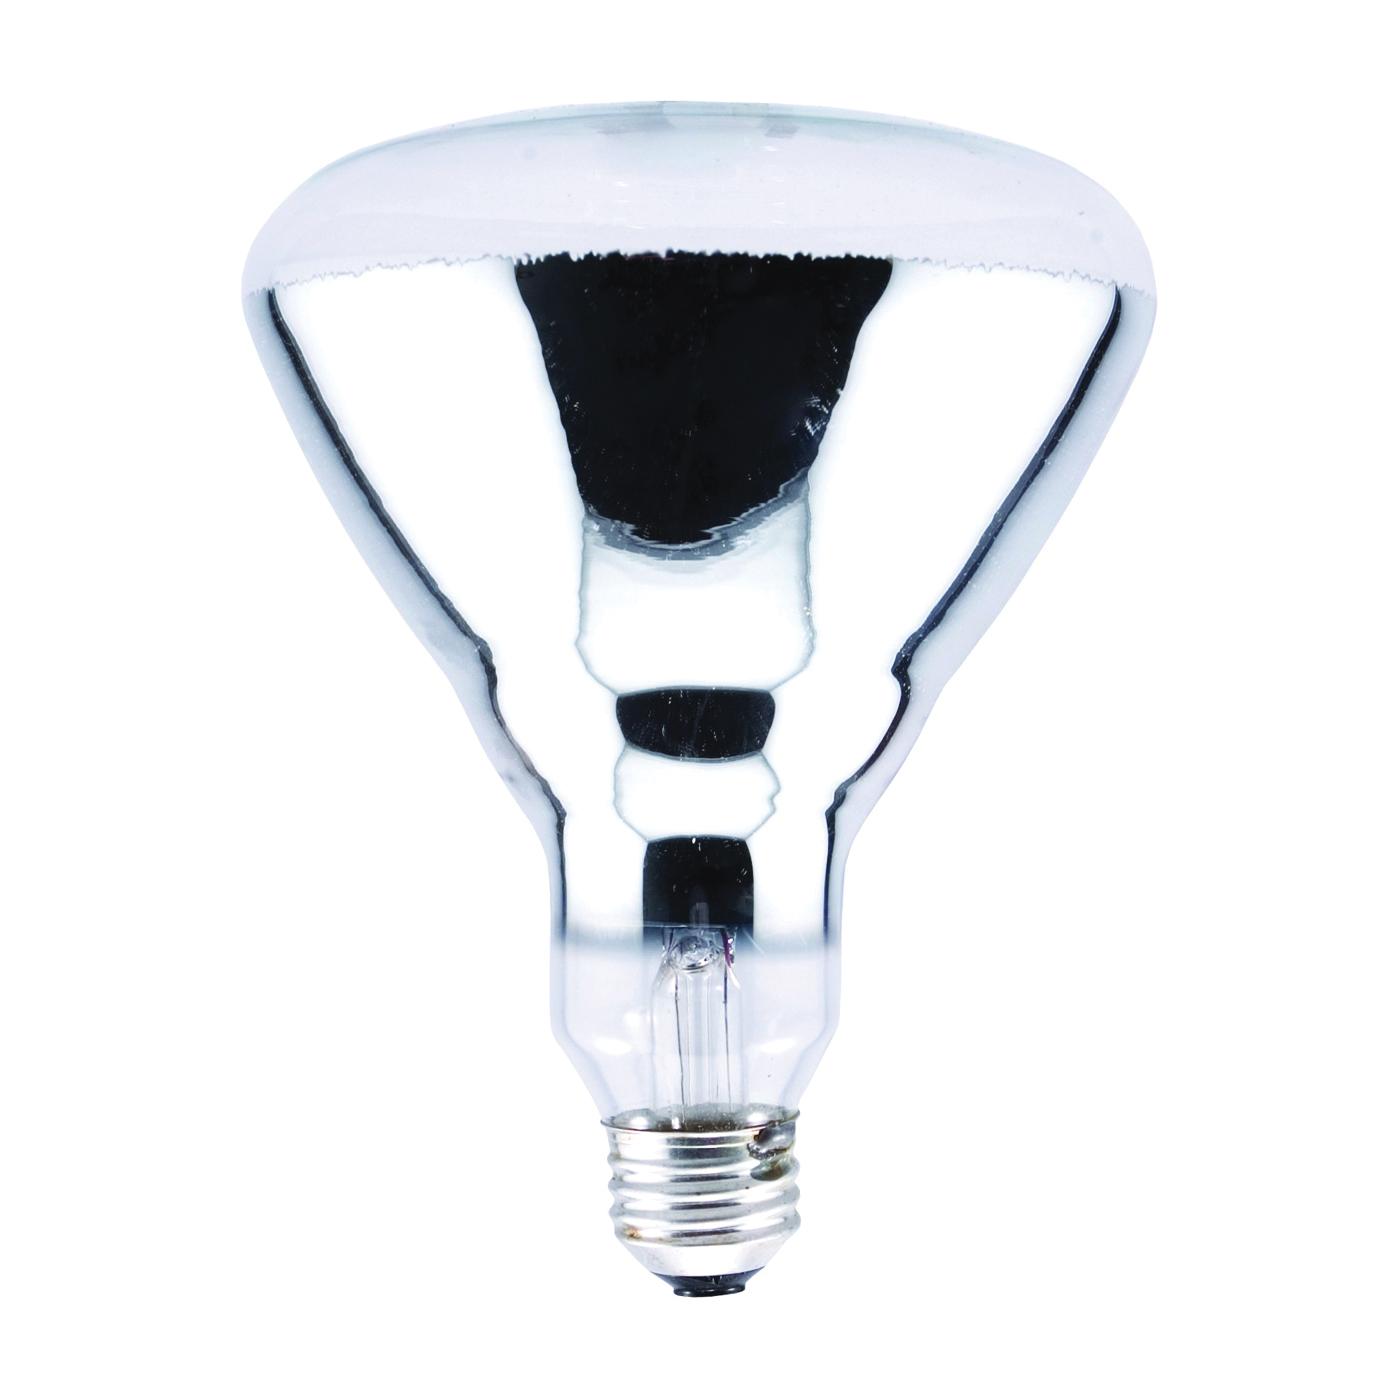 Picture of Sylvania 14664 Incandescent Lamp, 50 W, BR40 Lamp, Medium E26 Lamp Base, 2000 Lumens, 2850 K Color Temp